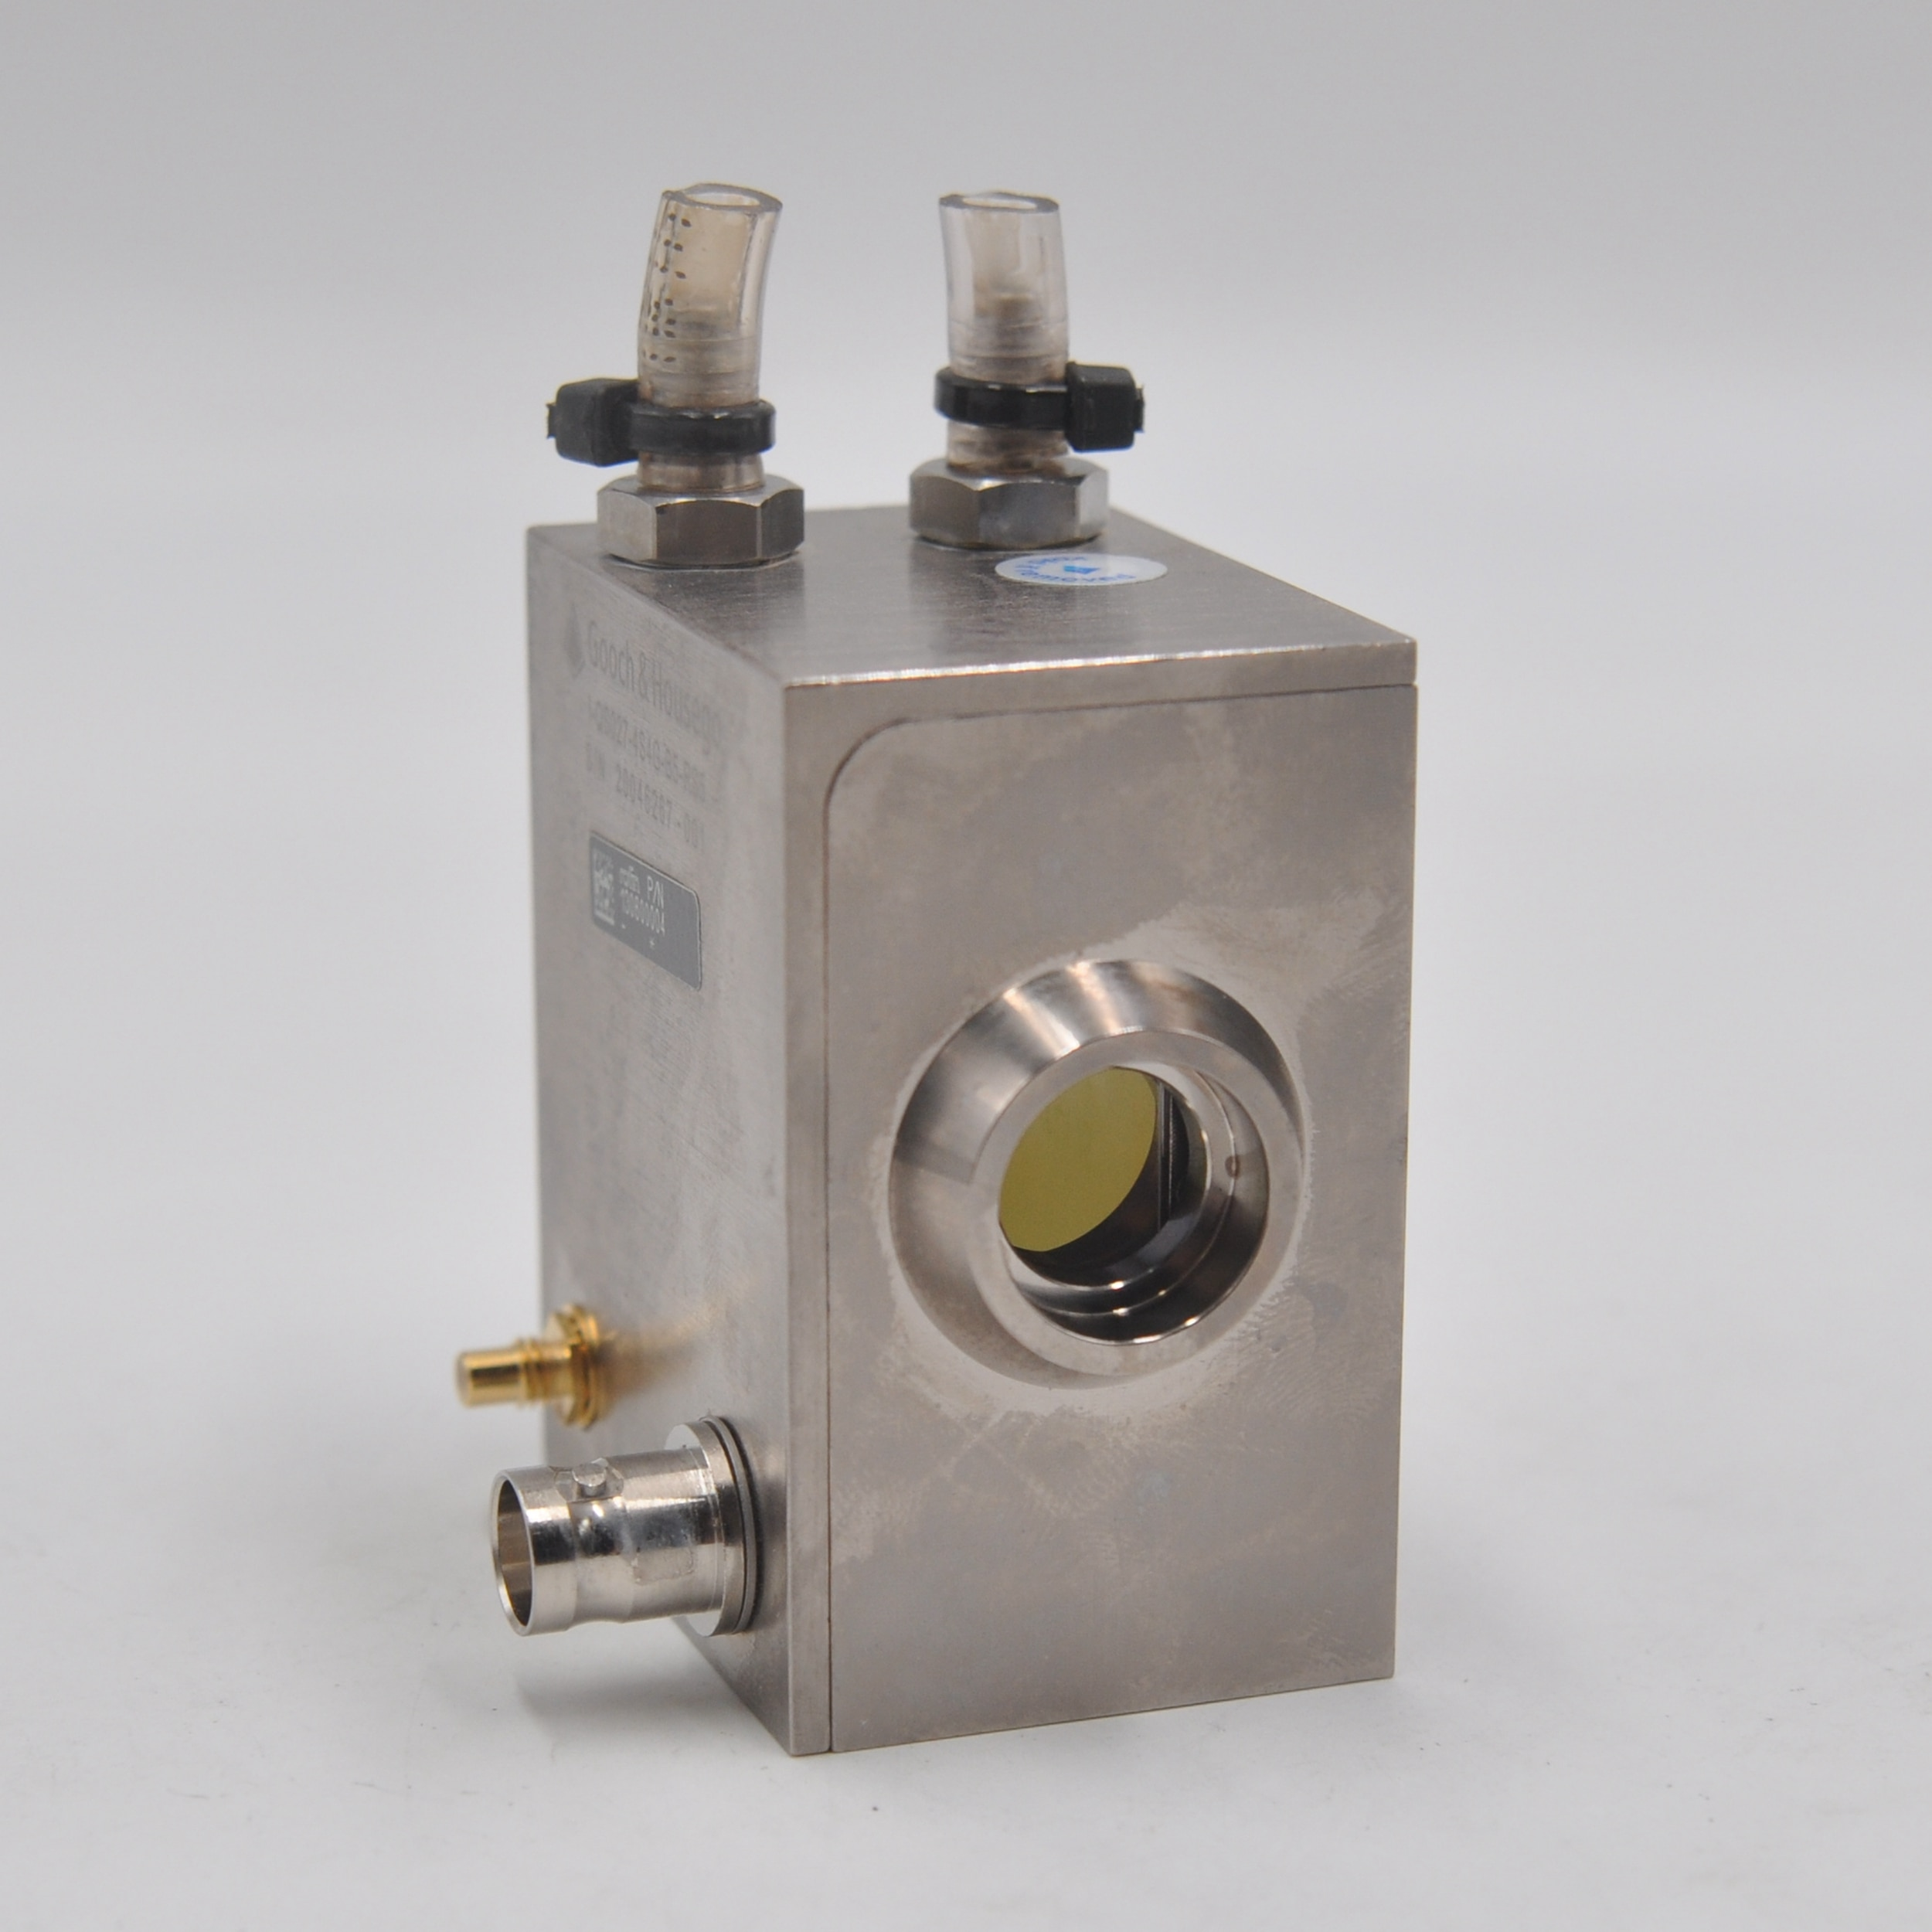 Gooch & Housego Q switch I-QS027-4S4G-B5-RS5 laser marking machine